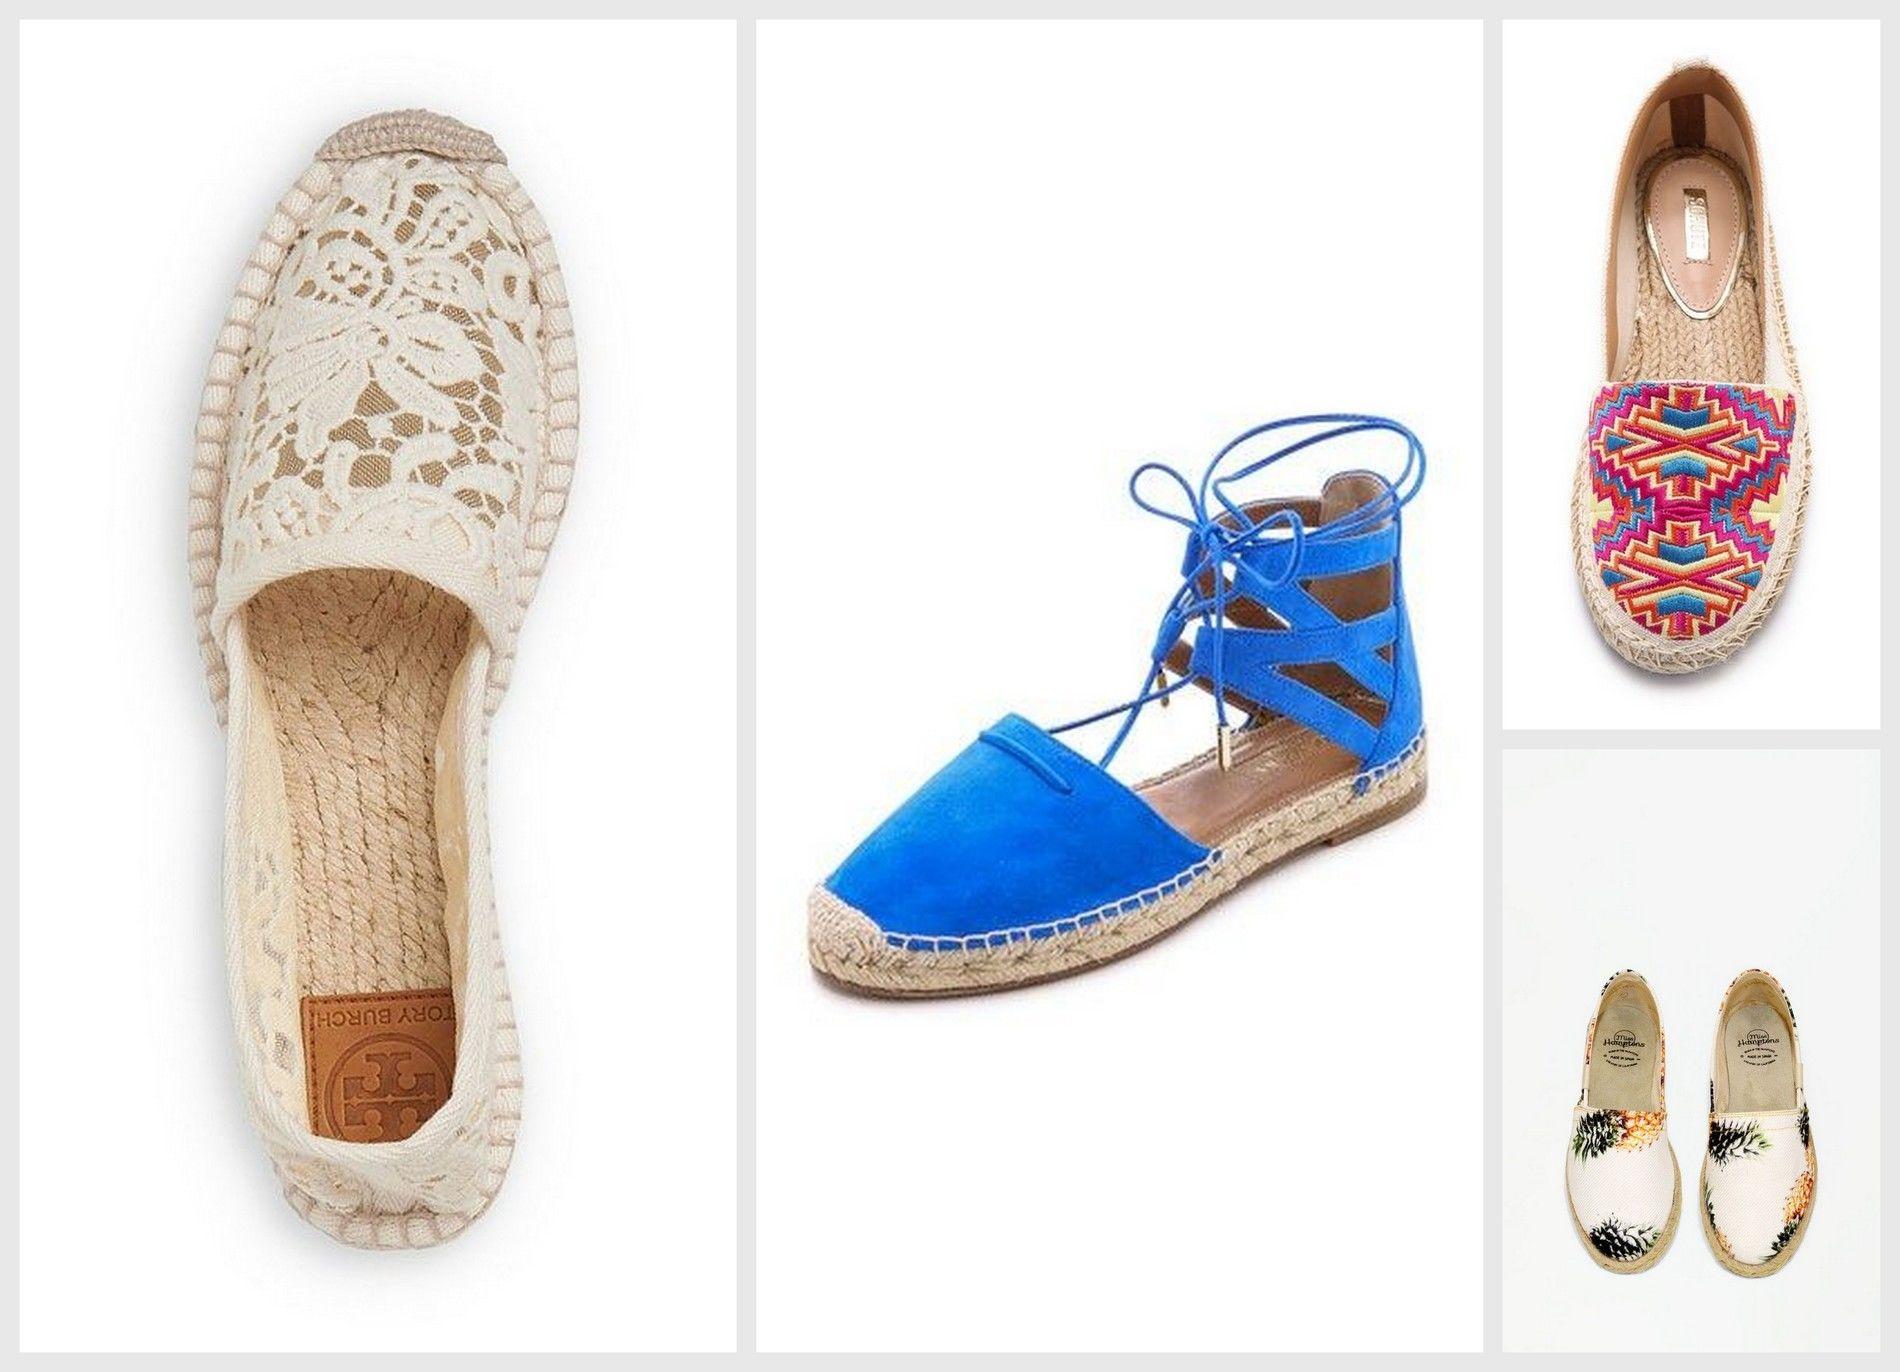 espadryle, modne buty na lato Kupon pl